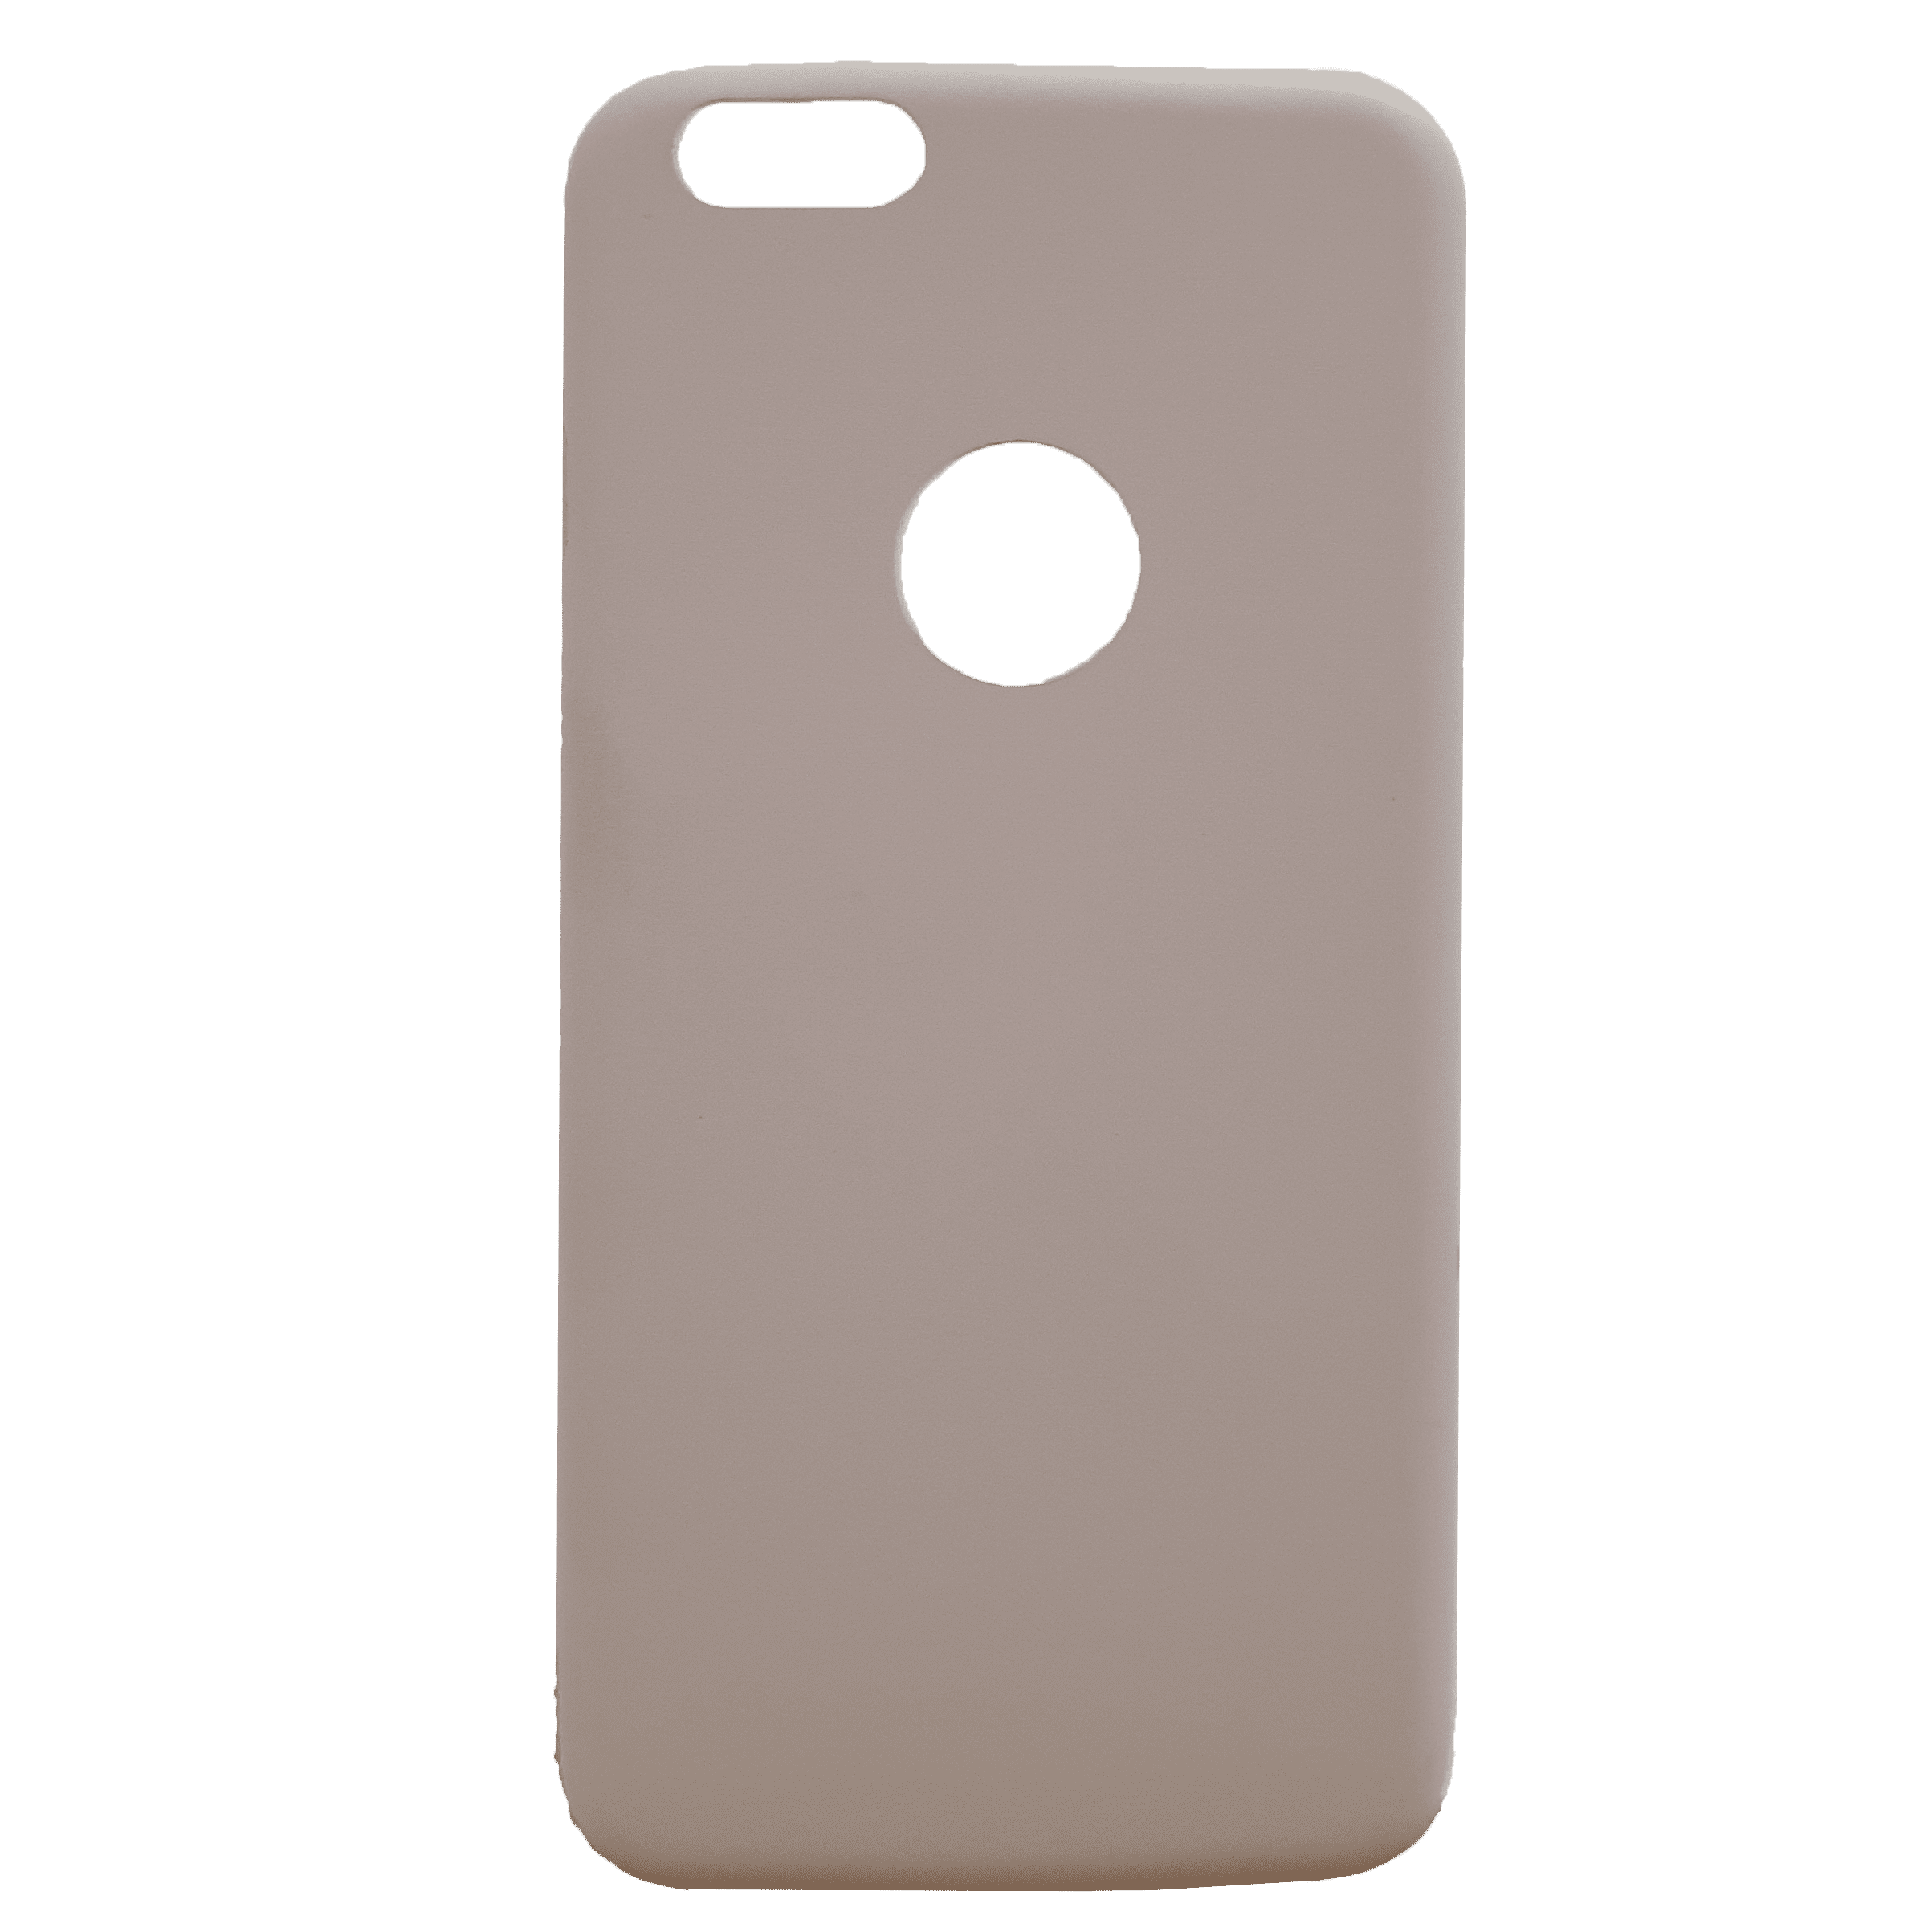 Mobilskal iPhone 6+ blek rosa, hål för logo